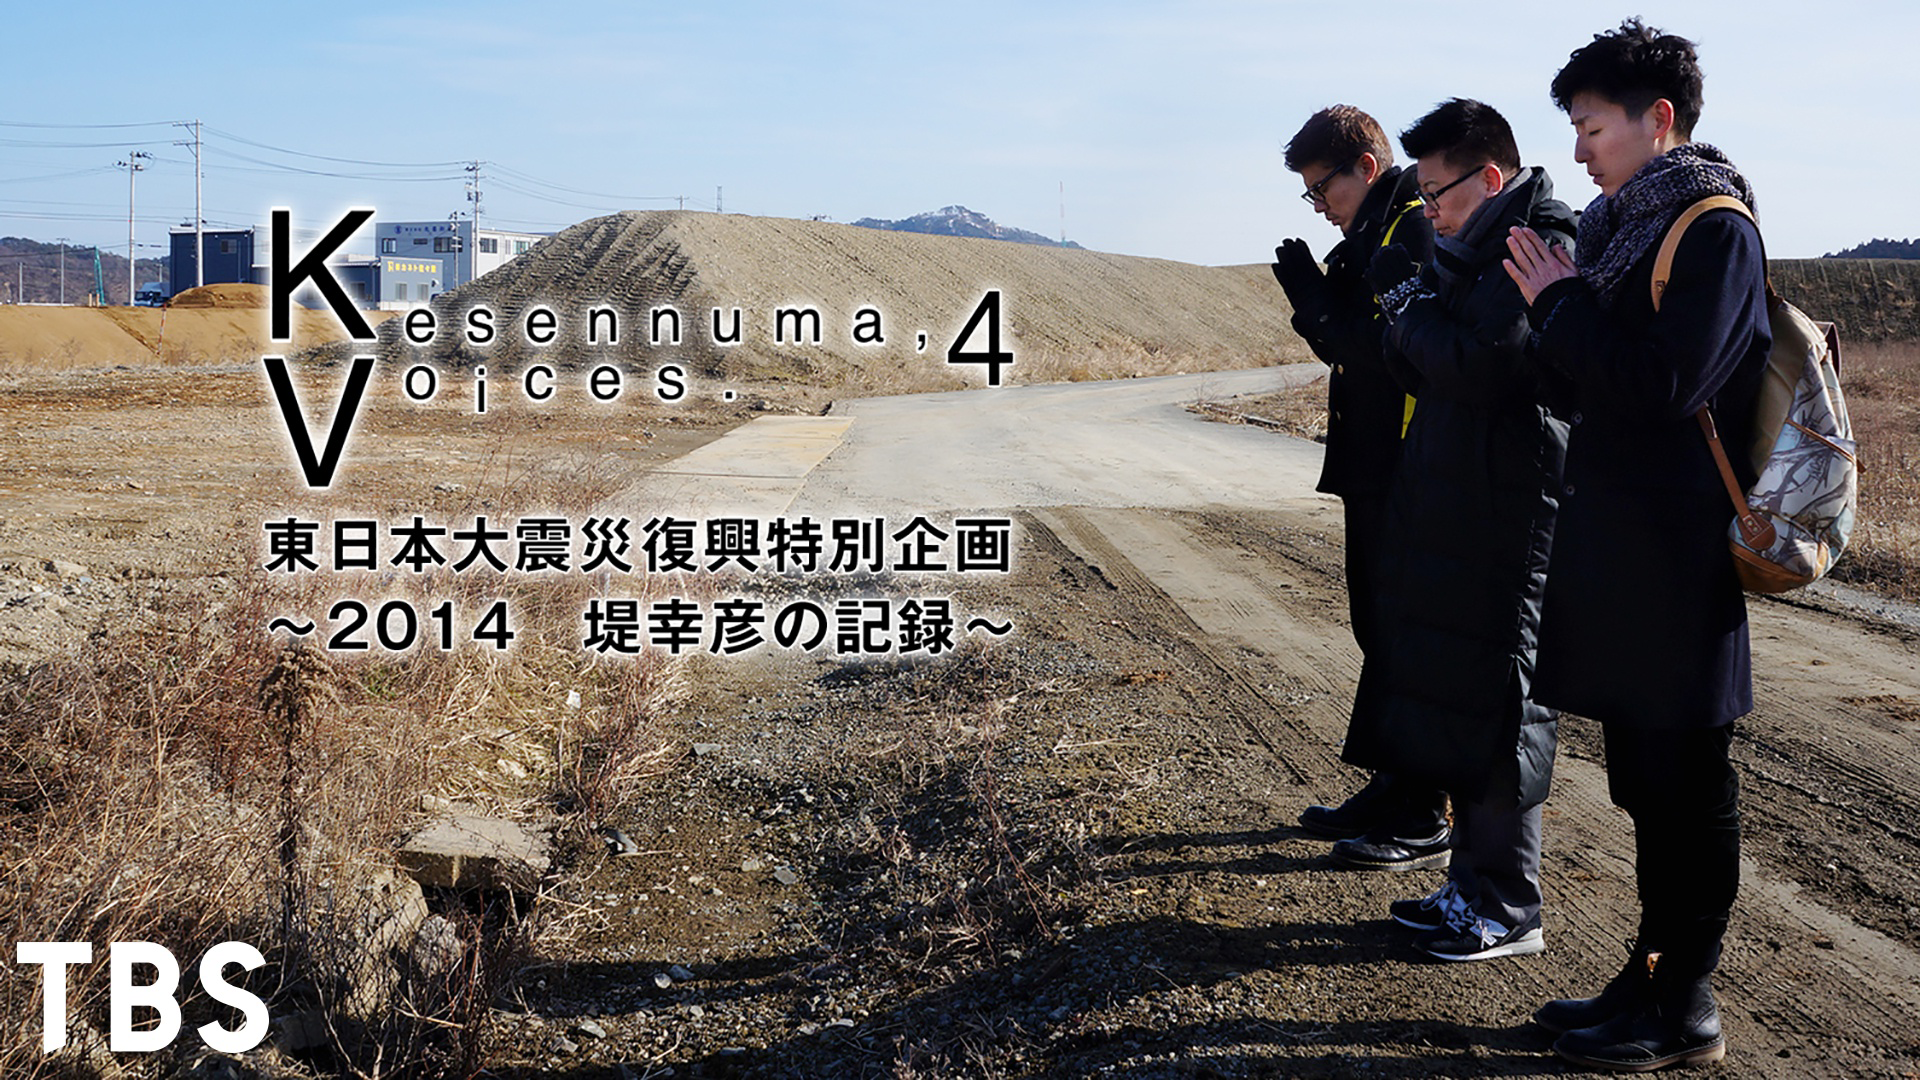 Kesennuma,Voices.4 東日本大震災復興特別企画~2014 堤幸彦の記録~